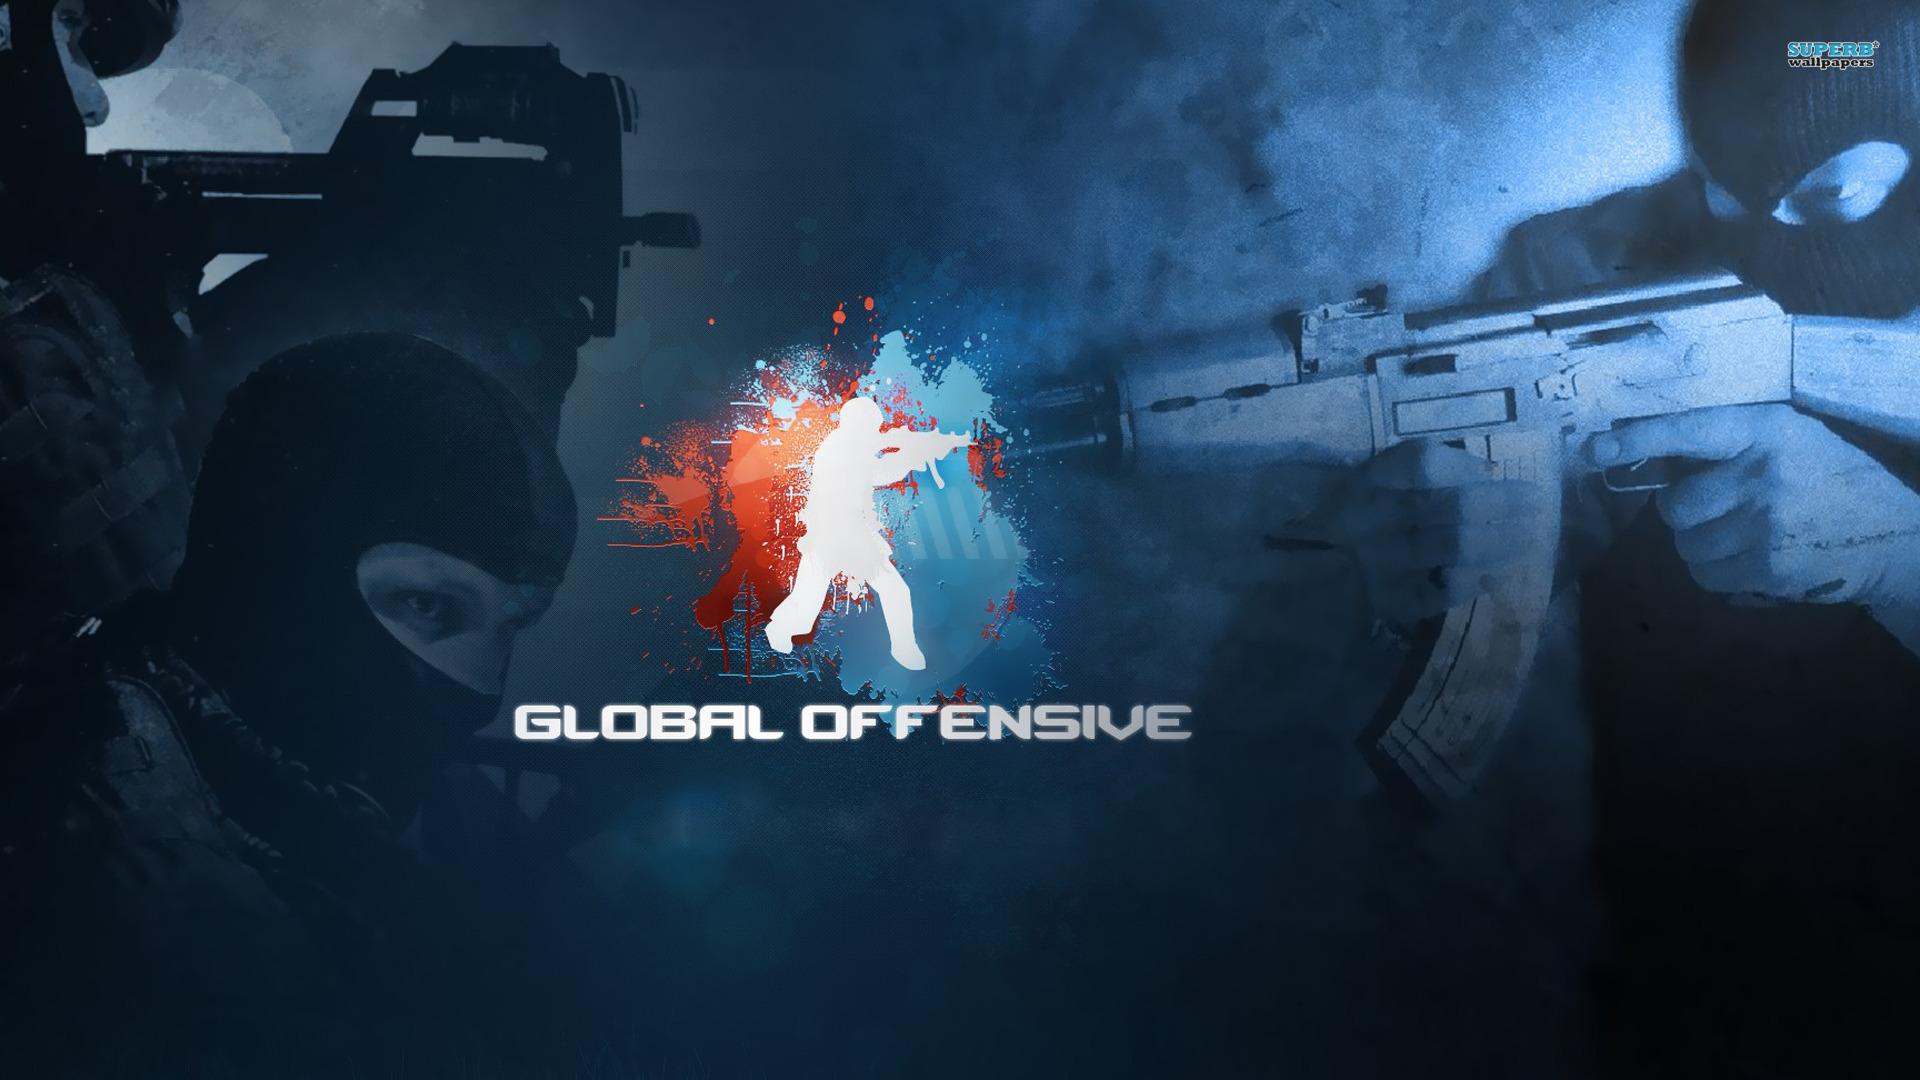 1384951608 counter strike global offensive 14730 1920x1080jpg 1920x1080